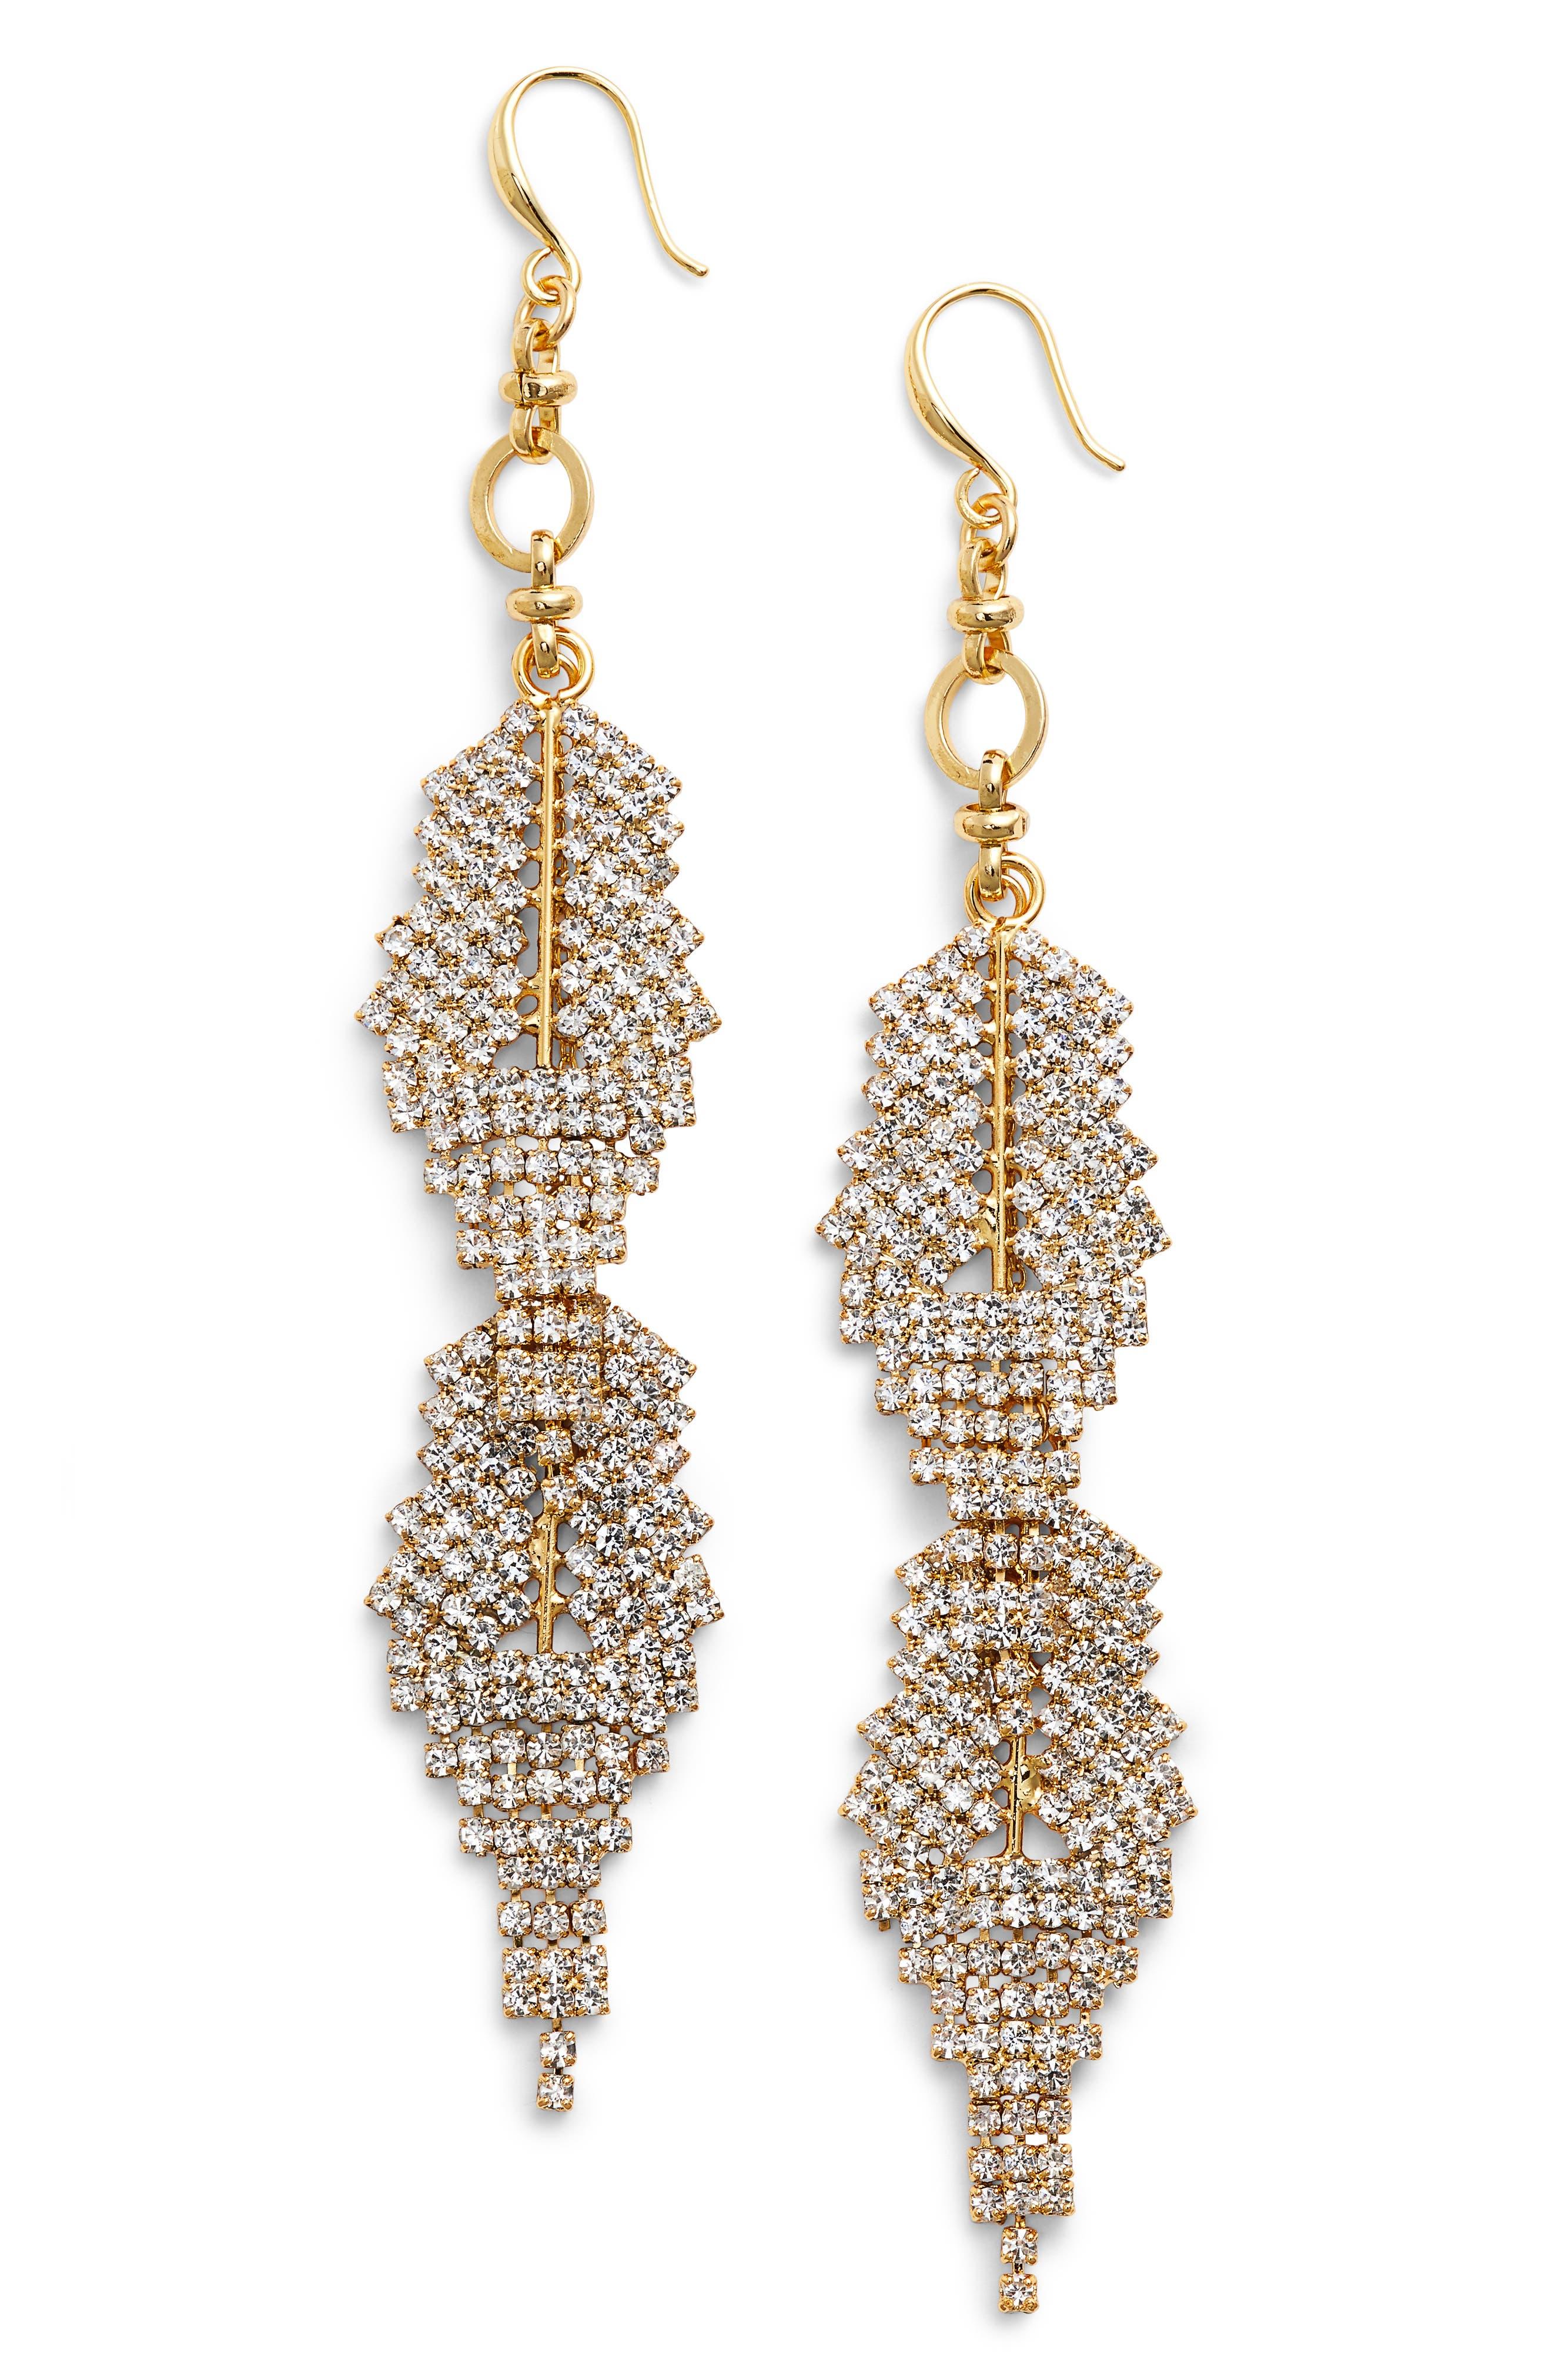 Badgley Mischka Crystal Drop Earrings,                         Main,                         color, 710